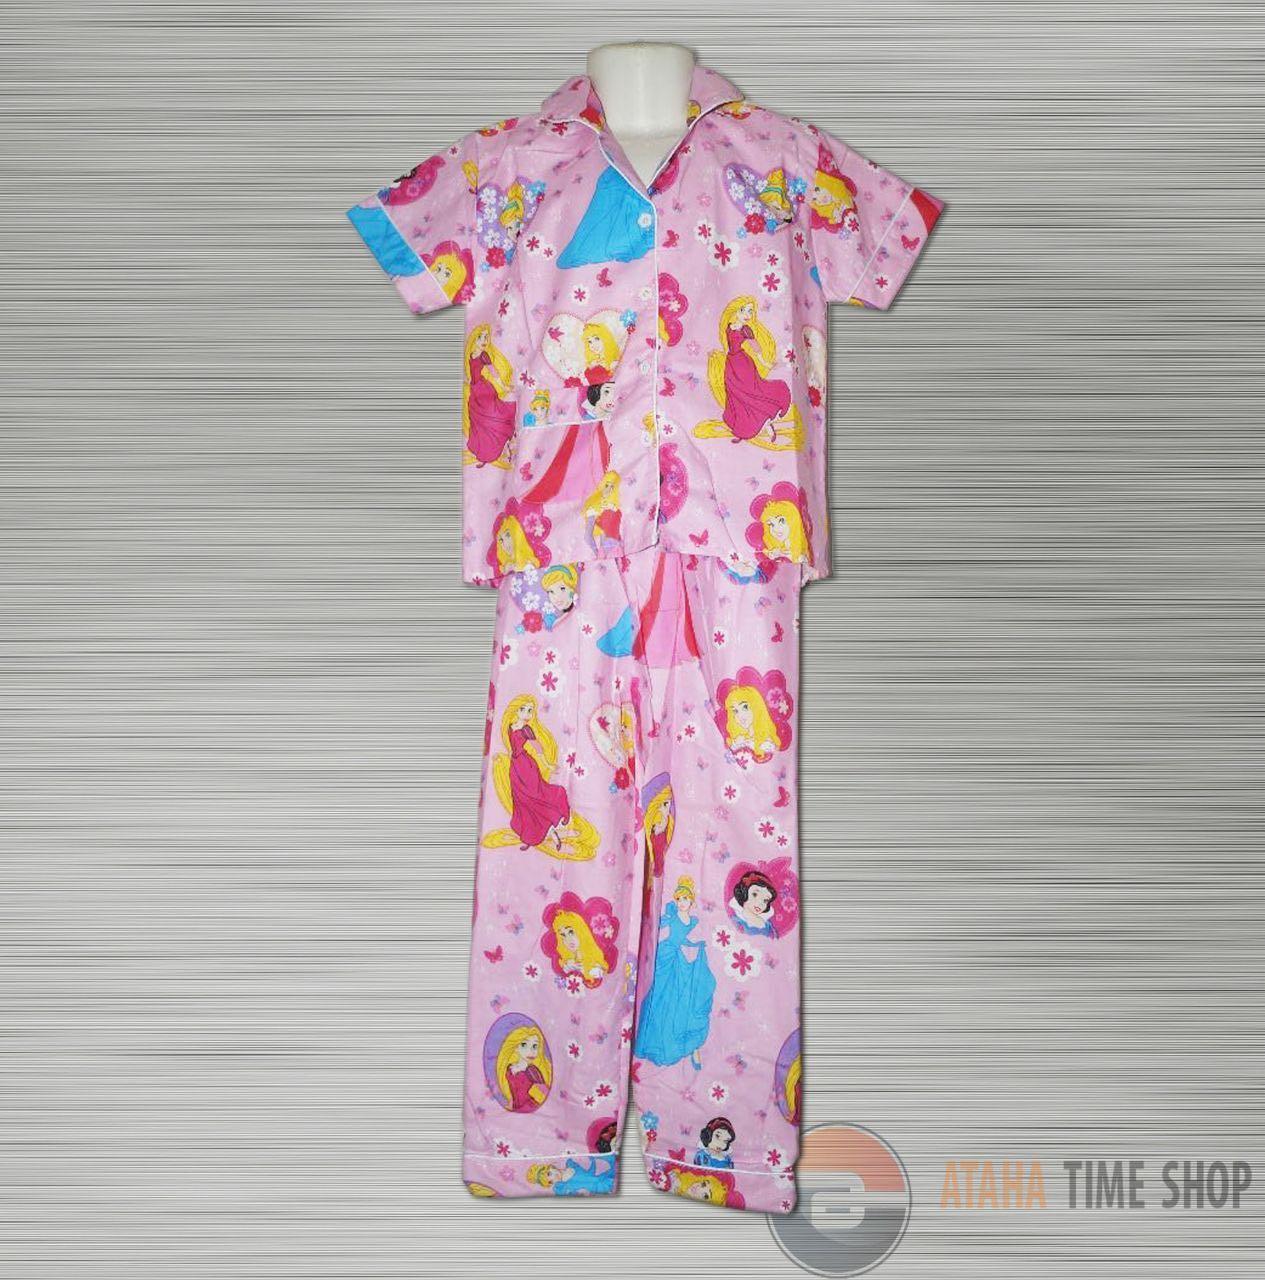 Piyama Atau Baju Tidur Anak FROZEN ( 4-7 Tahun)